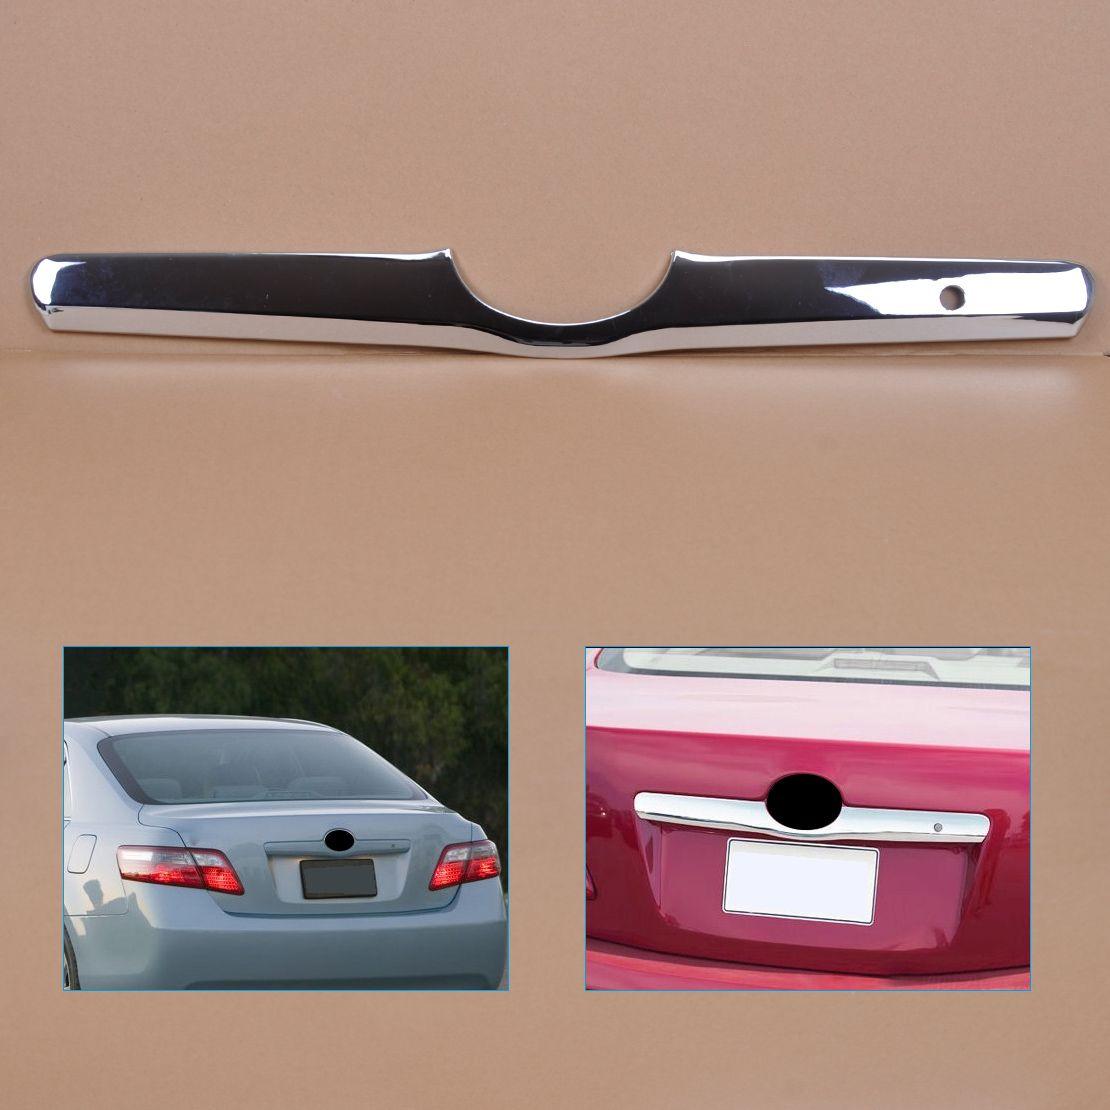 DWCX Car Chrome Decorative Rear Door Tailgate Trunk Hatch Trim Bezel Cover Fit for Toyota Camry 2006 2007 2008 2009 2010 2011